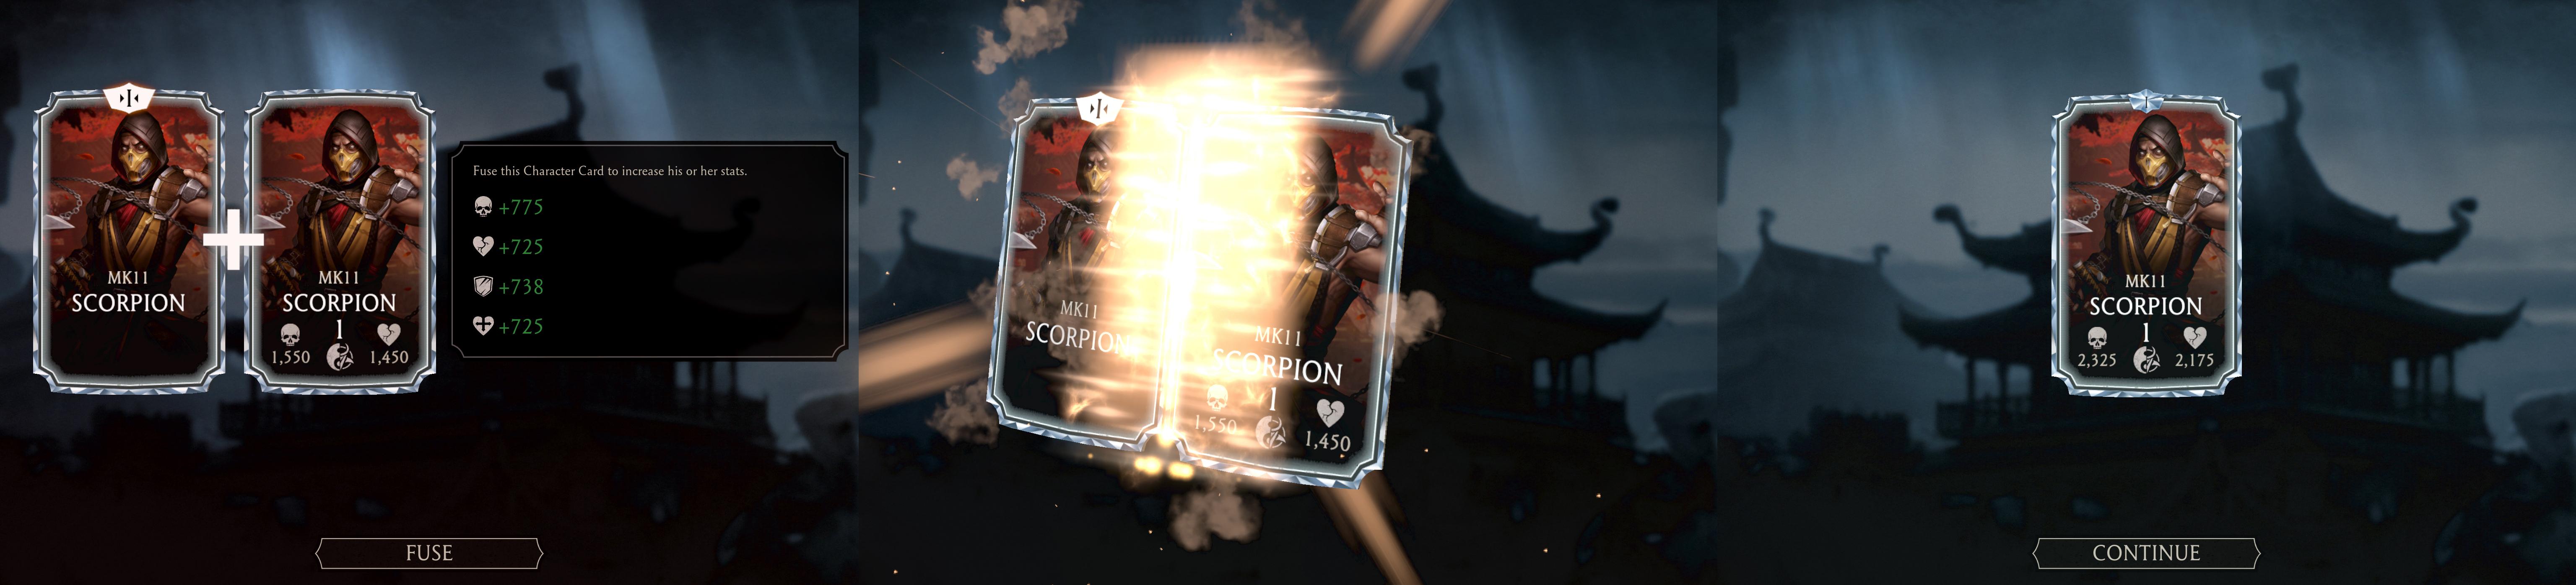 fusion_full.jpg